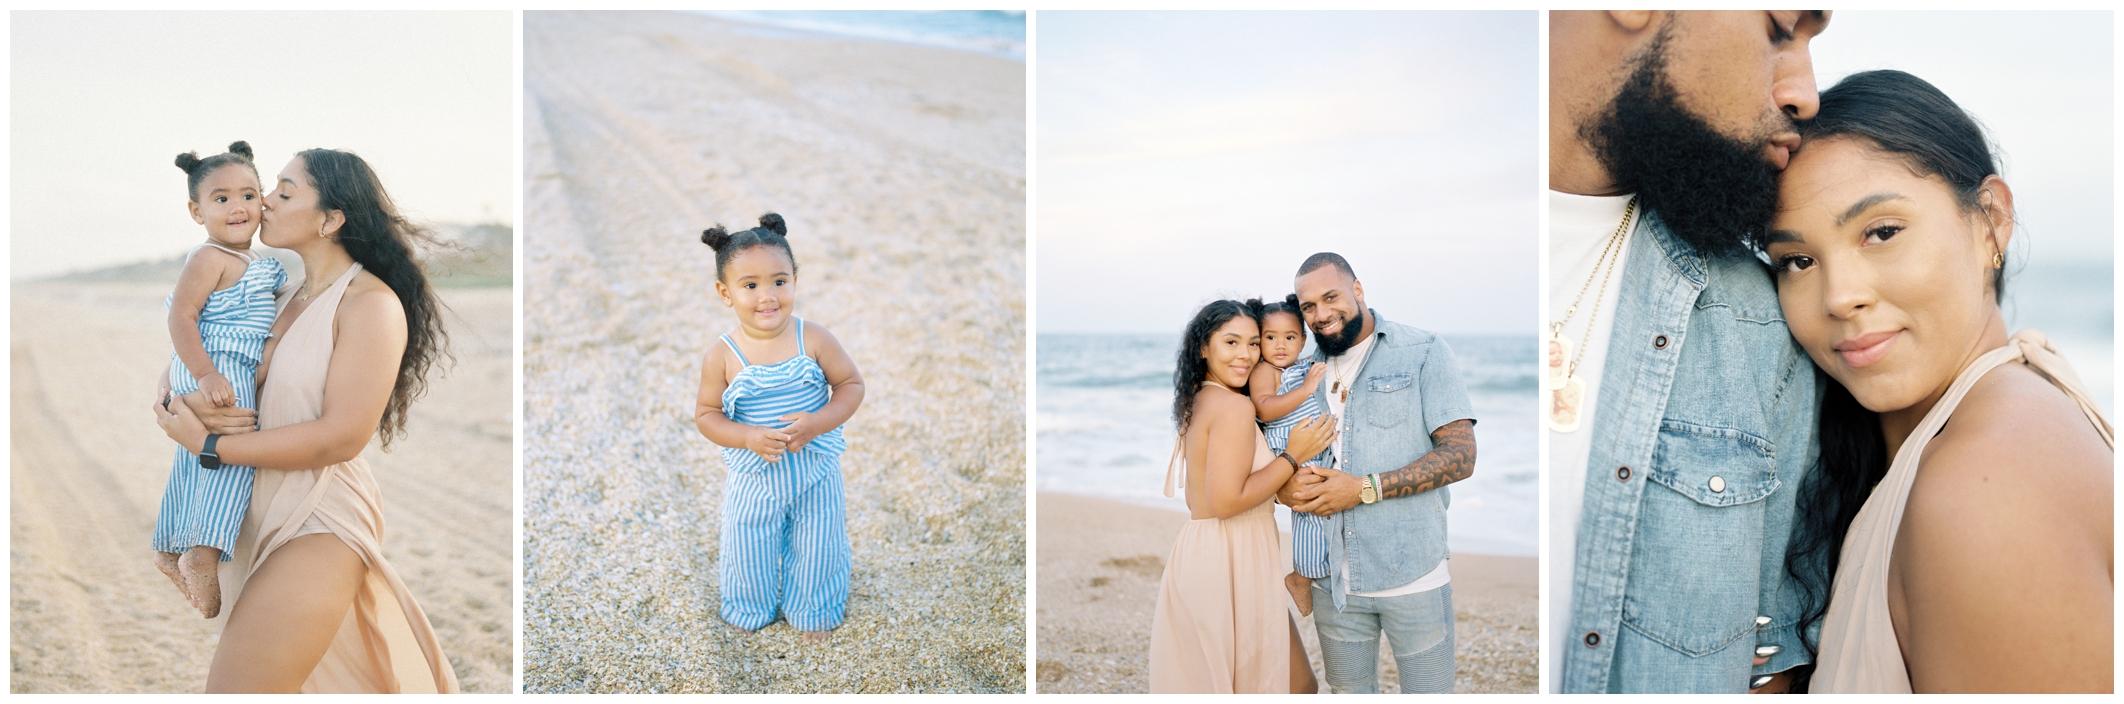 Lisa Silva Photography- Ponte Vedra Beach, St. Augustine and Jacksonville, Florida Fine Art Film Destination Wedding Photography- Family Lifestyle Session at Guana Preserve_0059.jpg